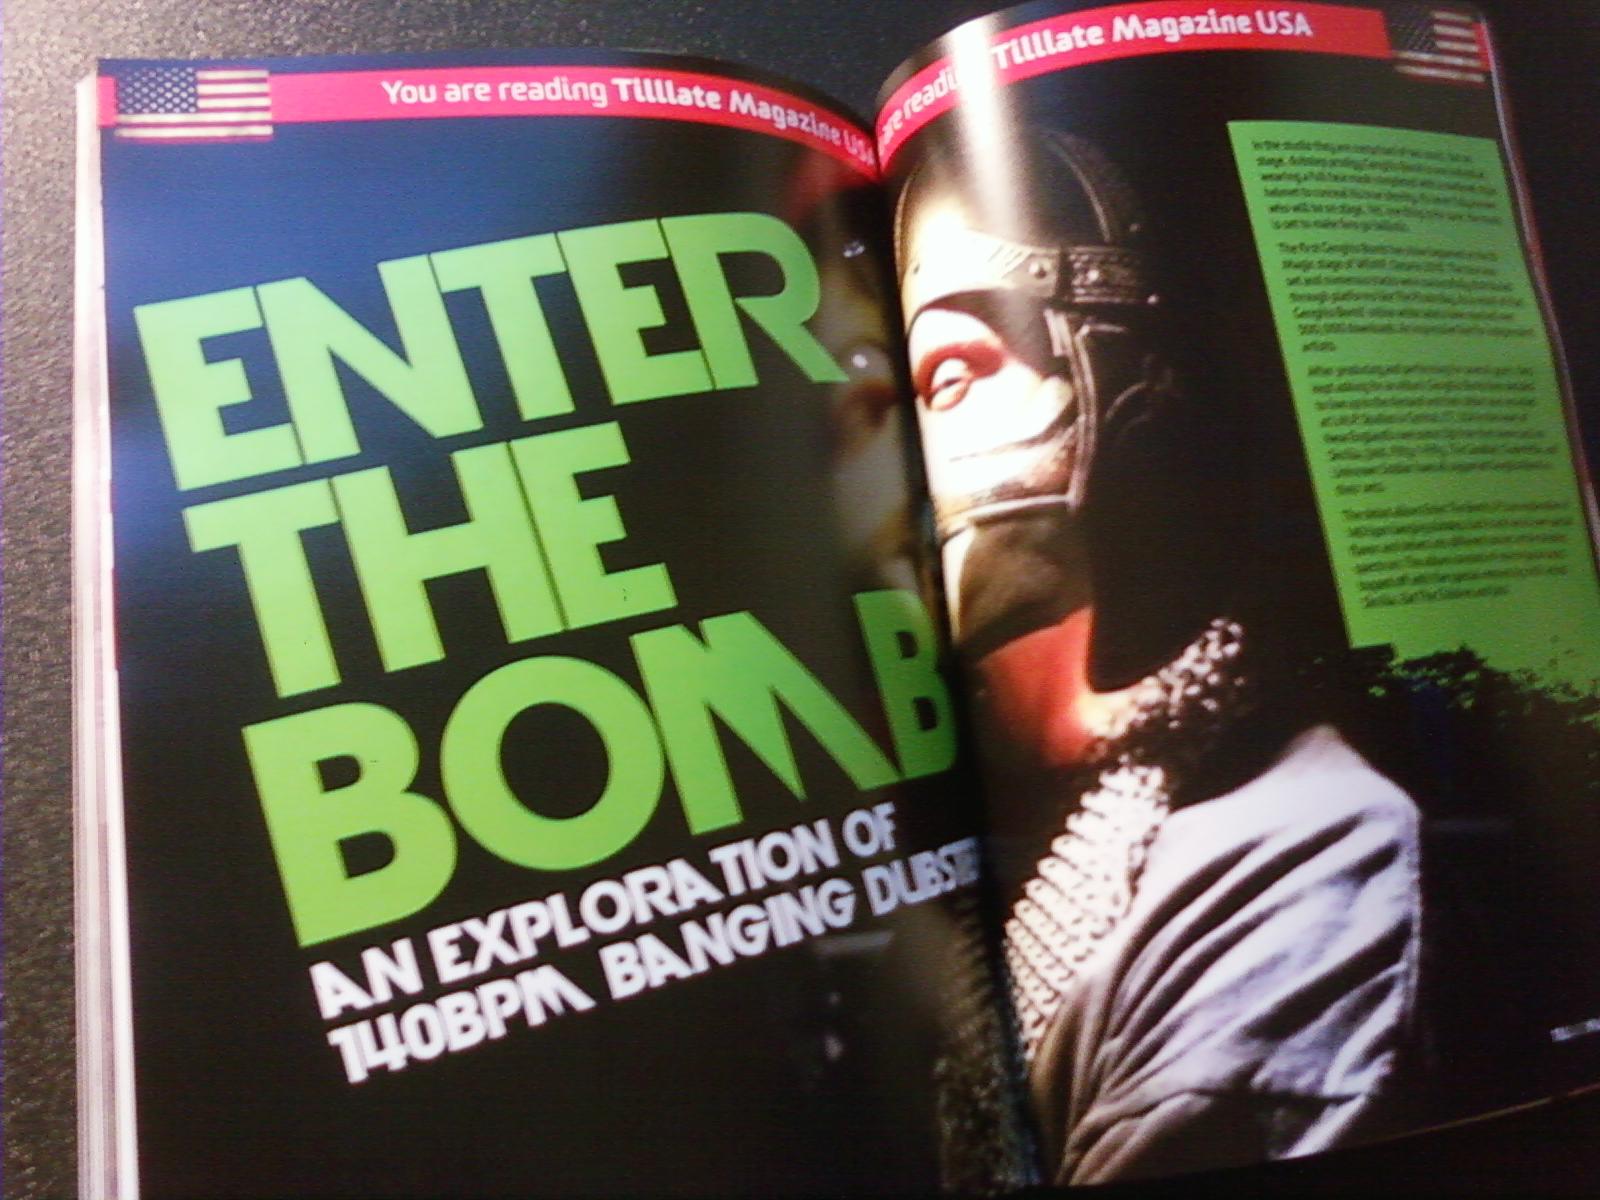 GENGHIS BOMB EXCLUSIVE INTERVIEW